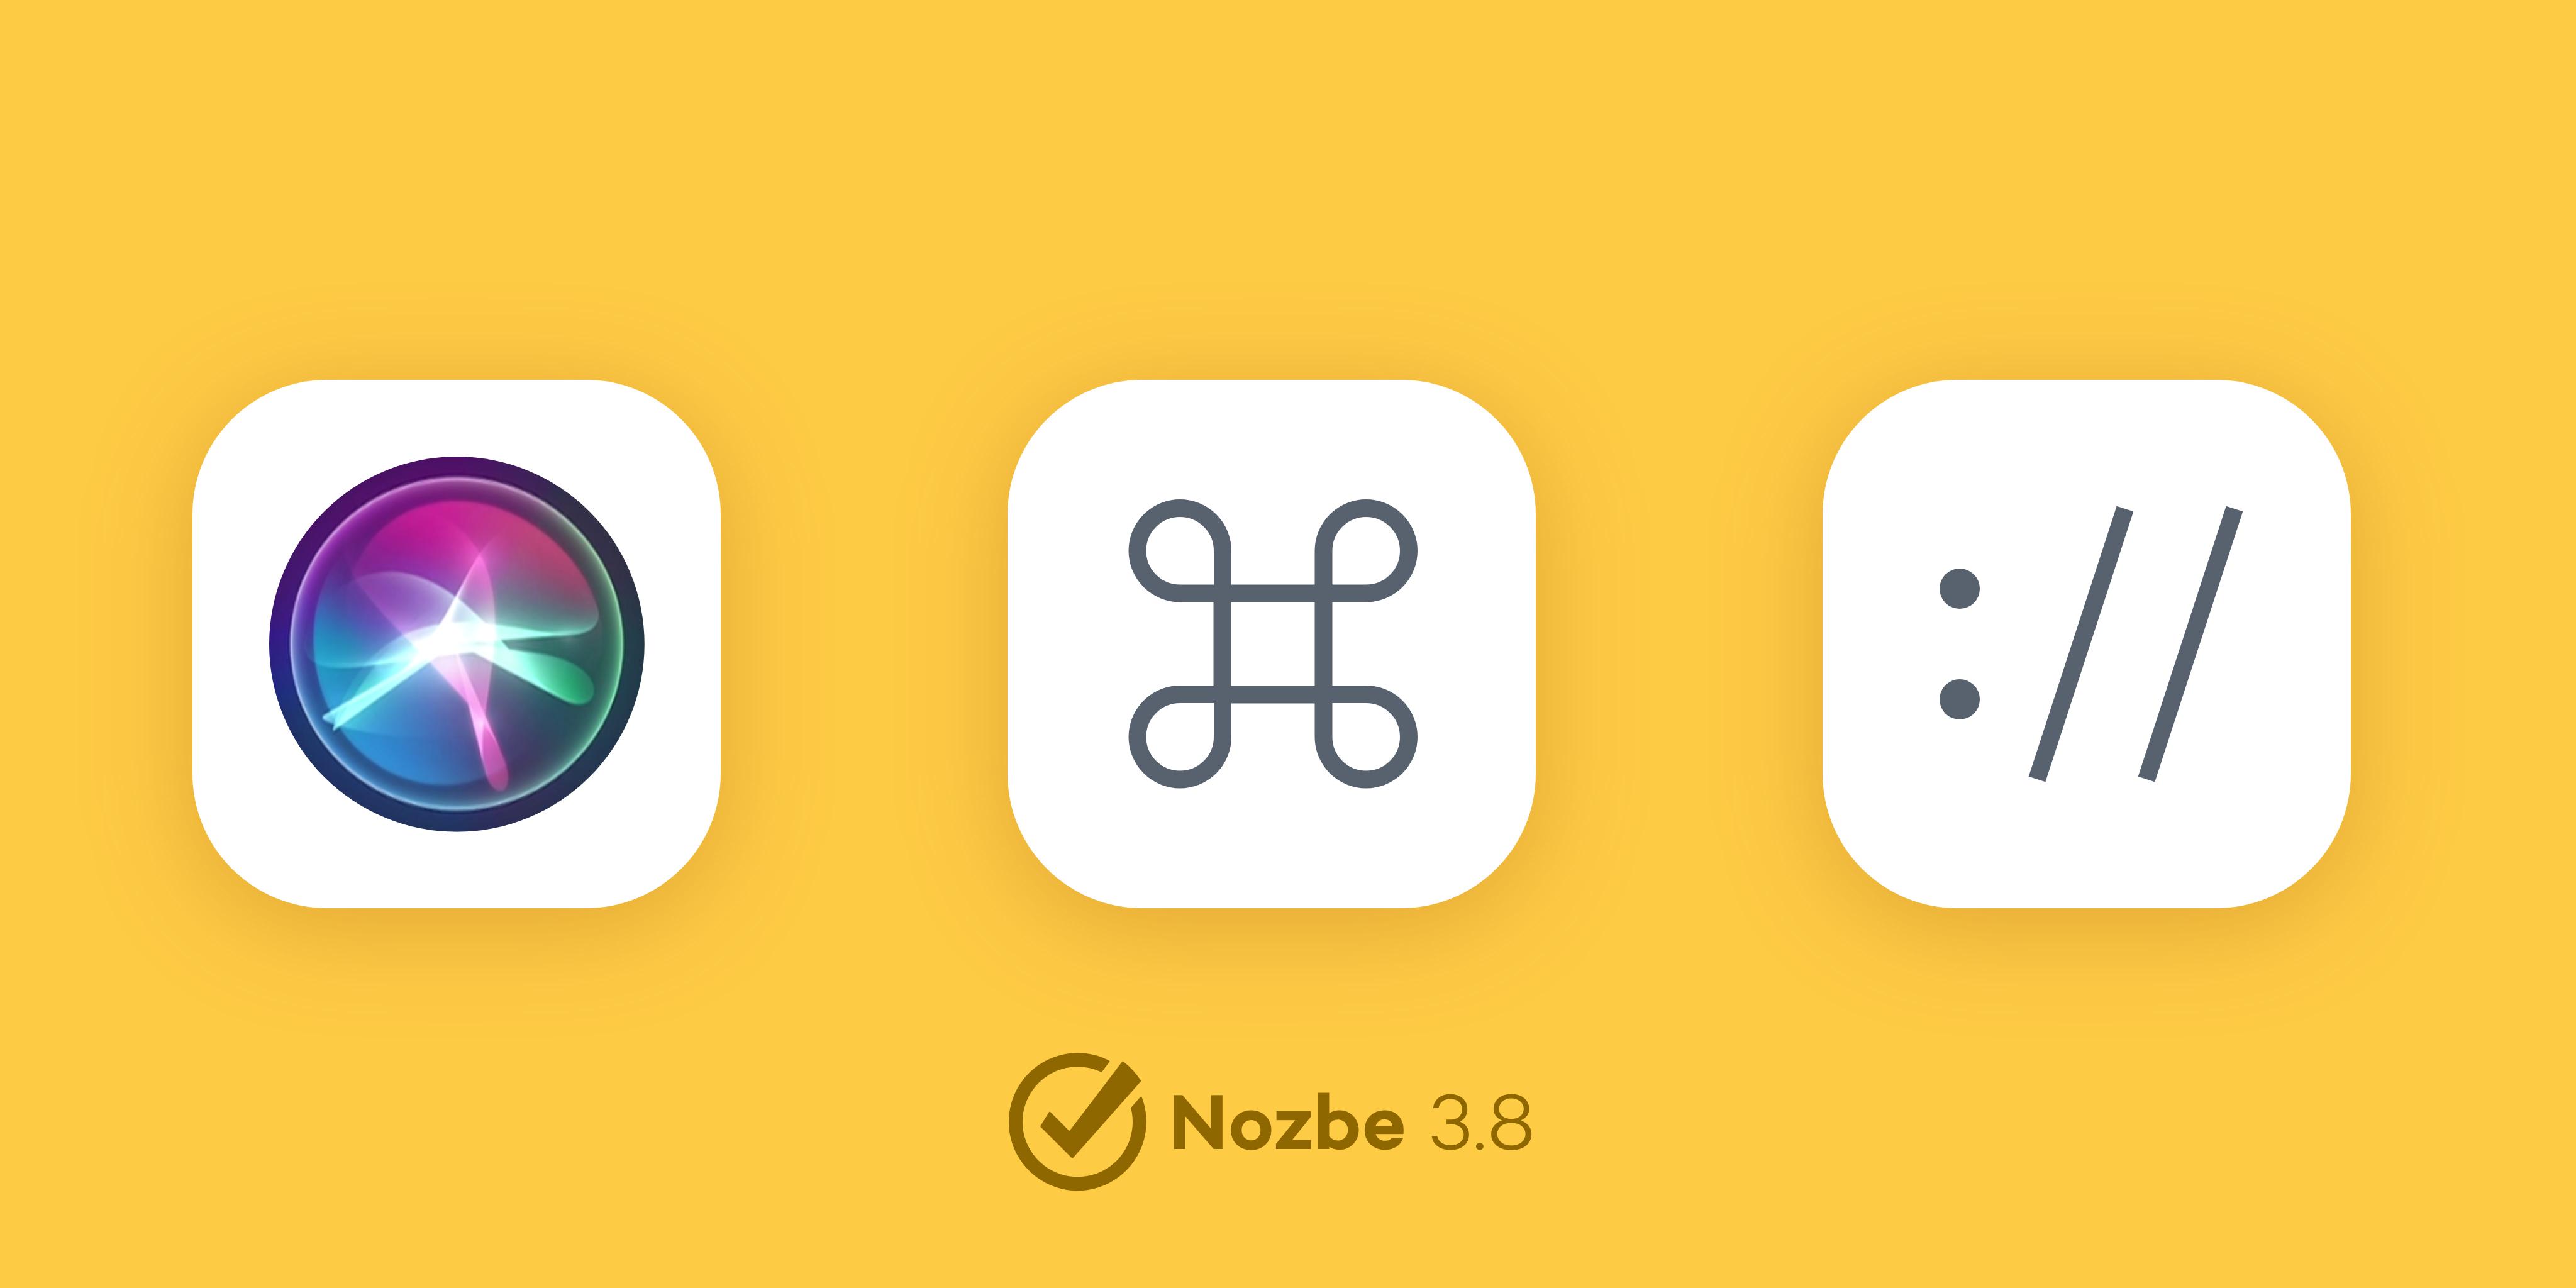 Brand new Nozbe 3.8